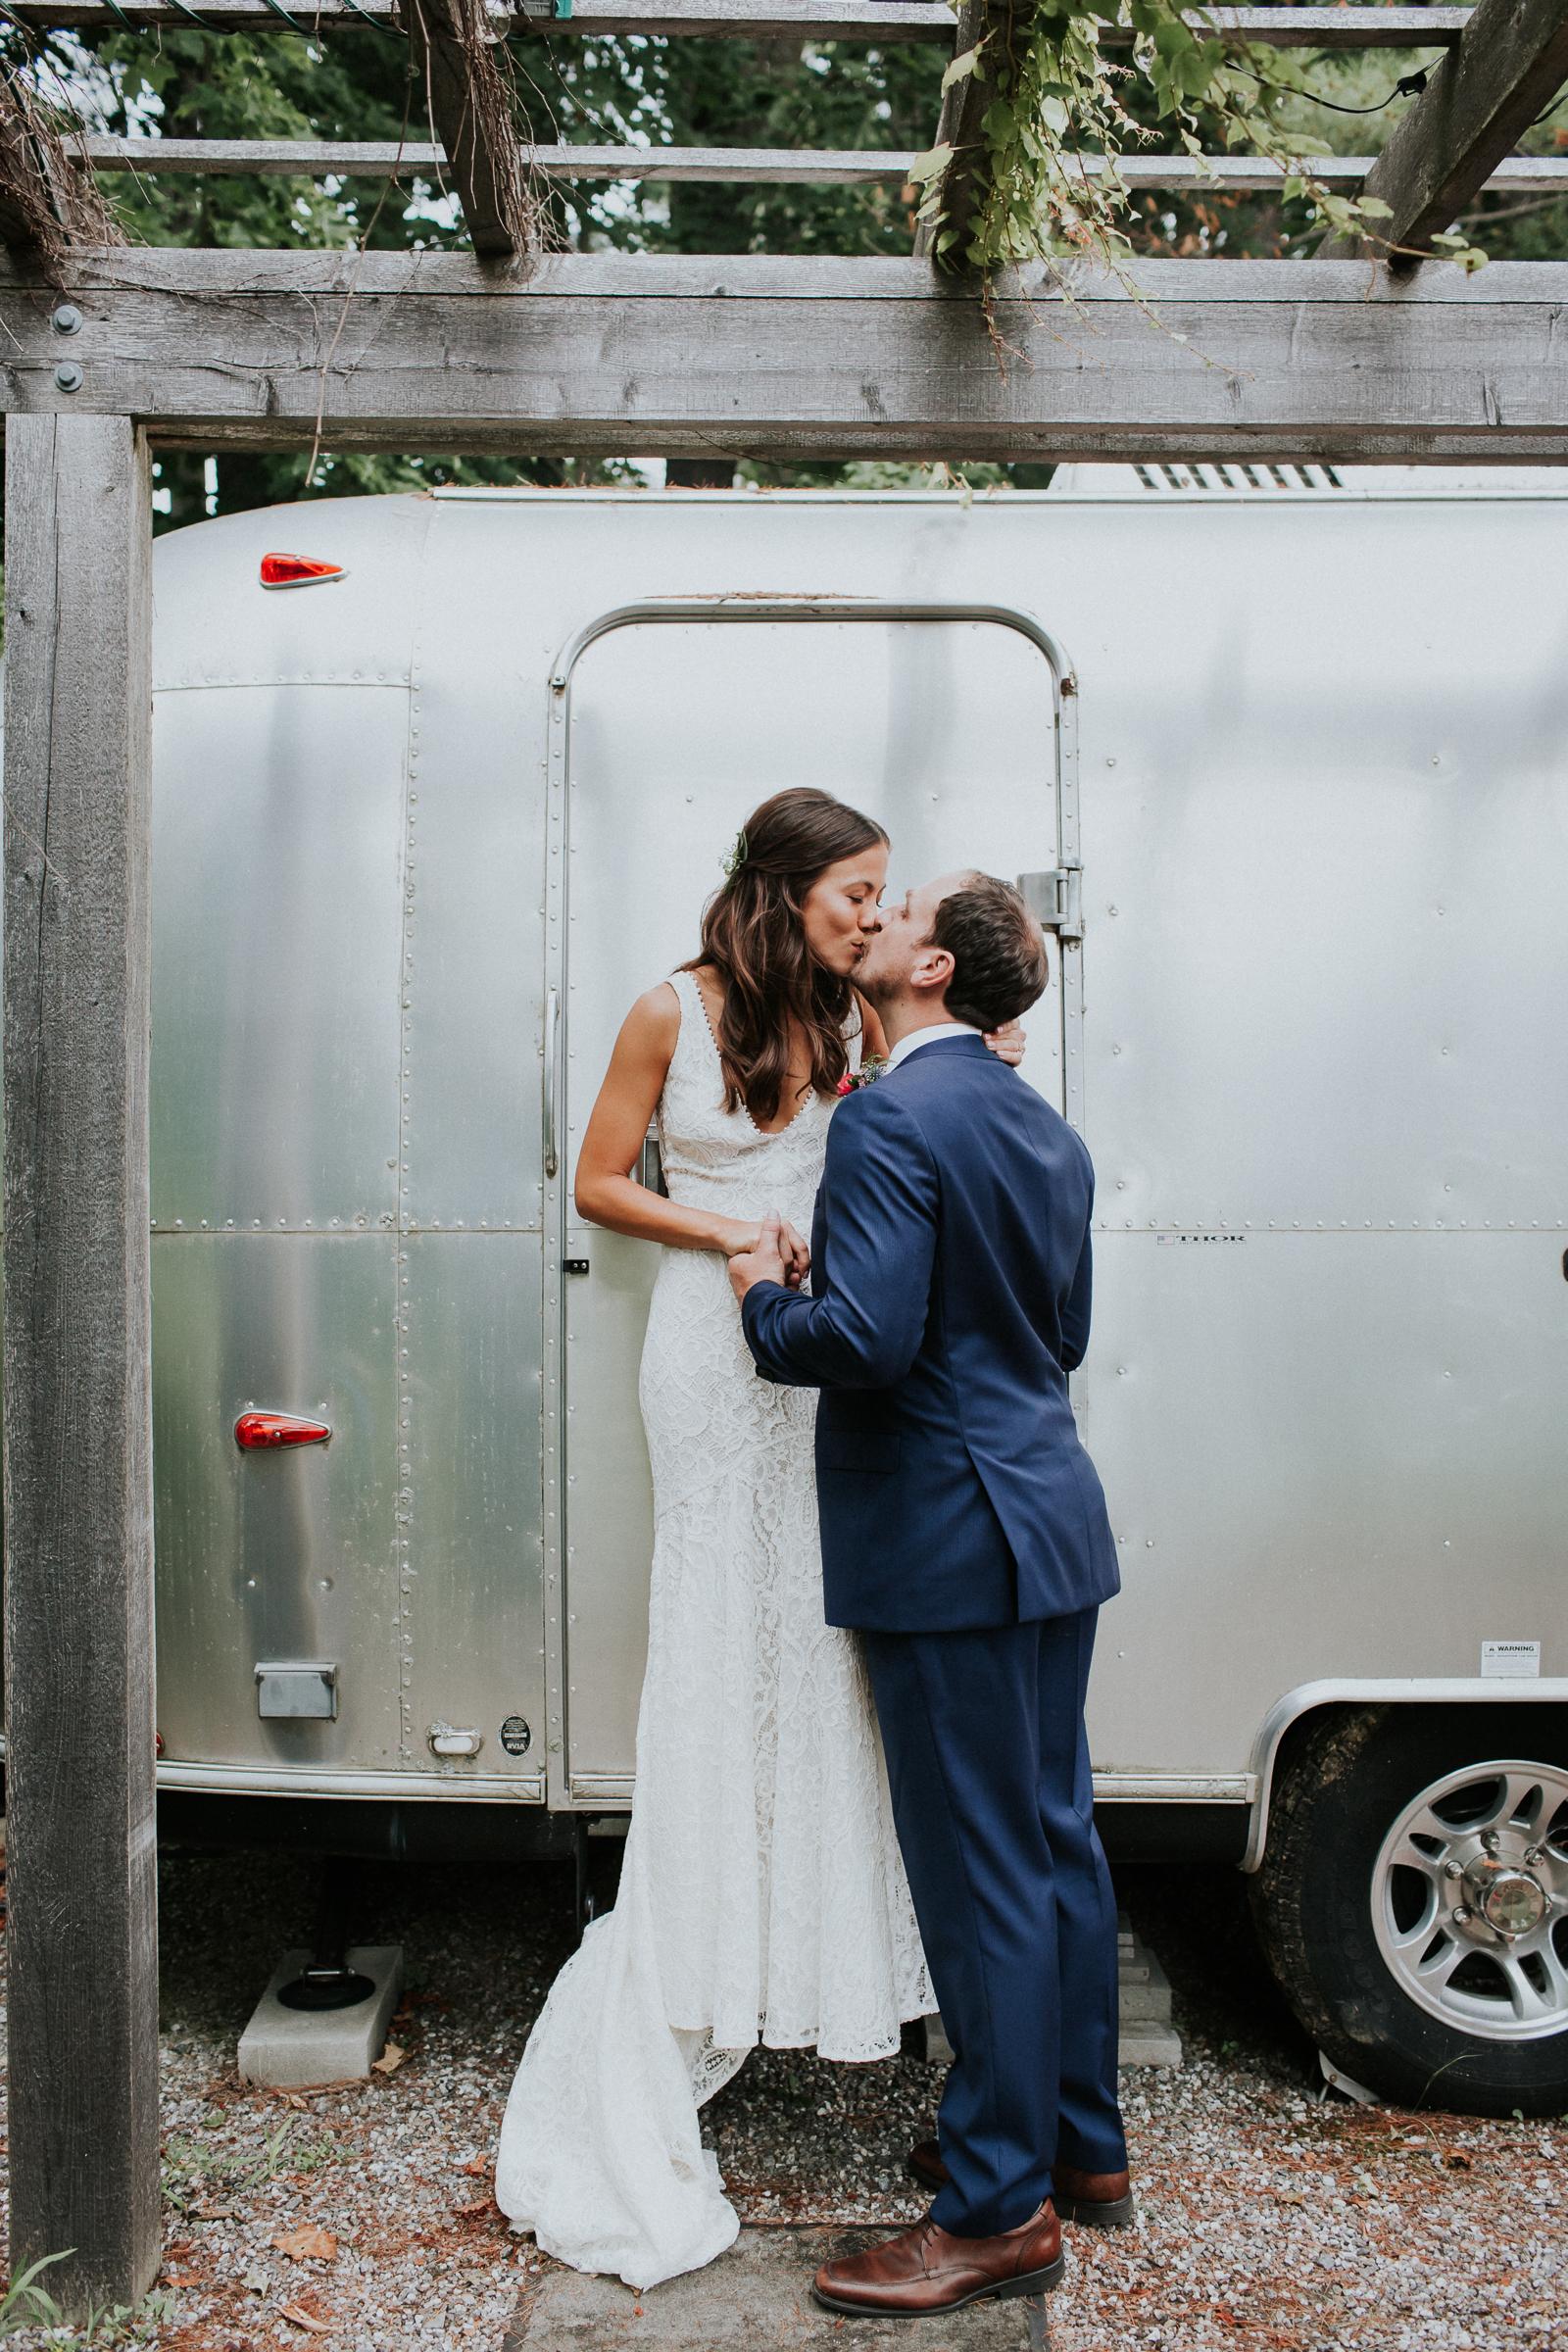 Marianmade-Farm-Wiscasset-Maine-Fine-Art-Documentary-Wedding-Photographer-Elvira-Kalviste-Photography-36.jpg